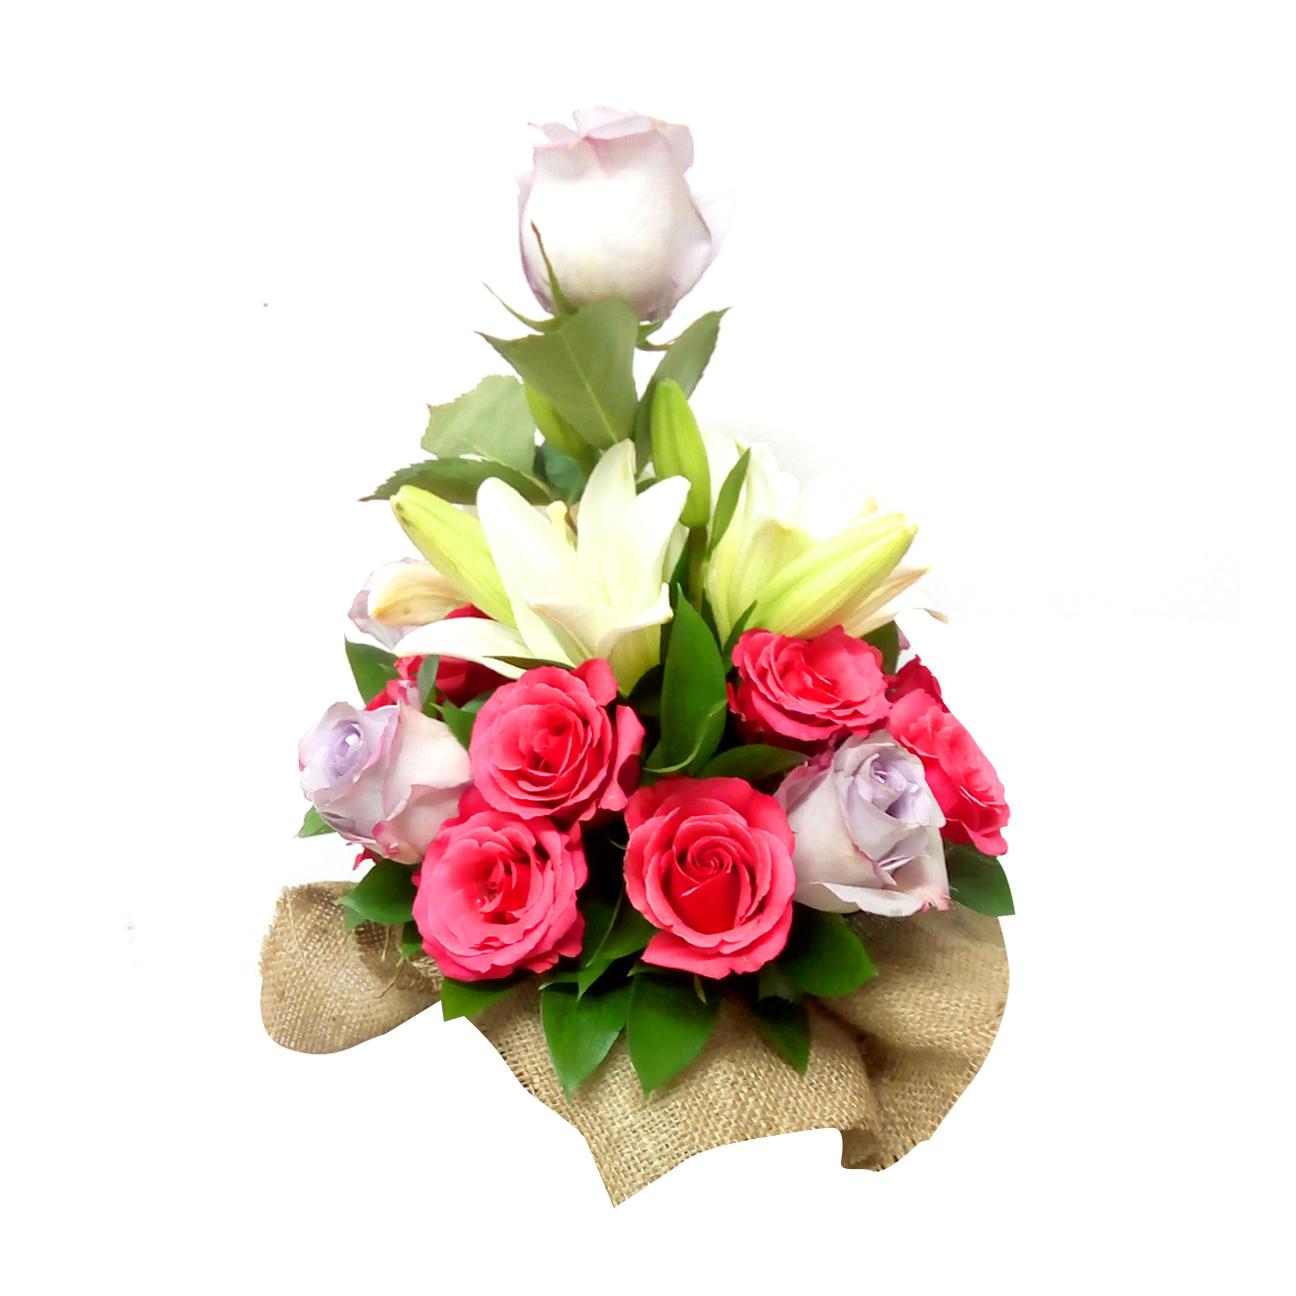 Canastillos con Rosas, Lilium mas Ruscus